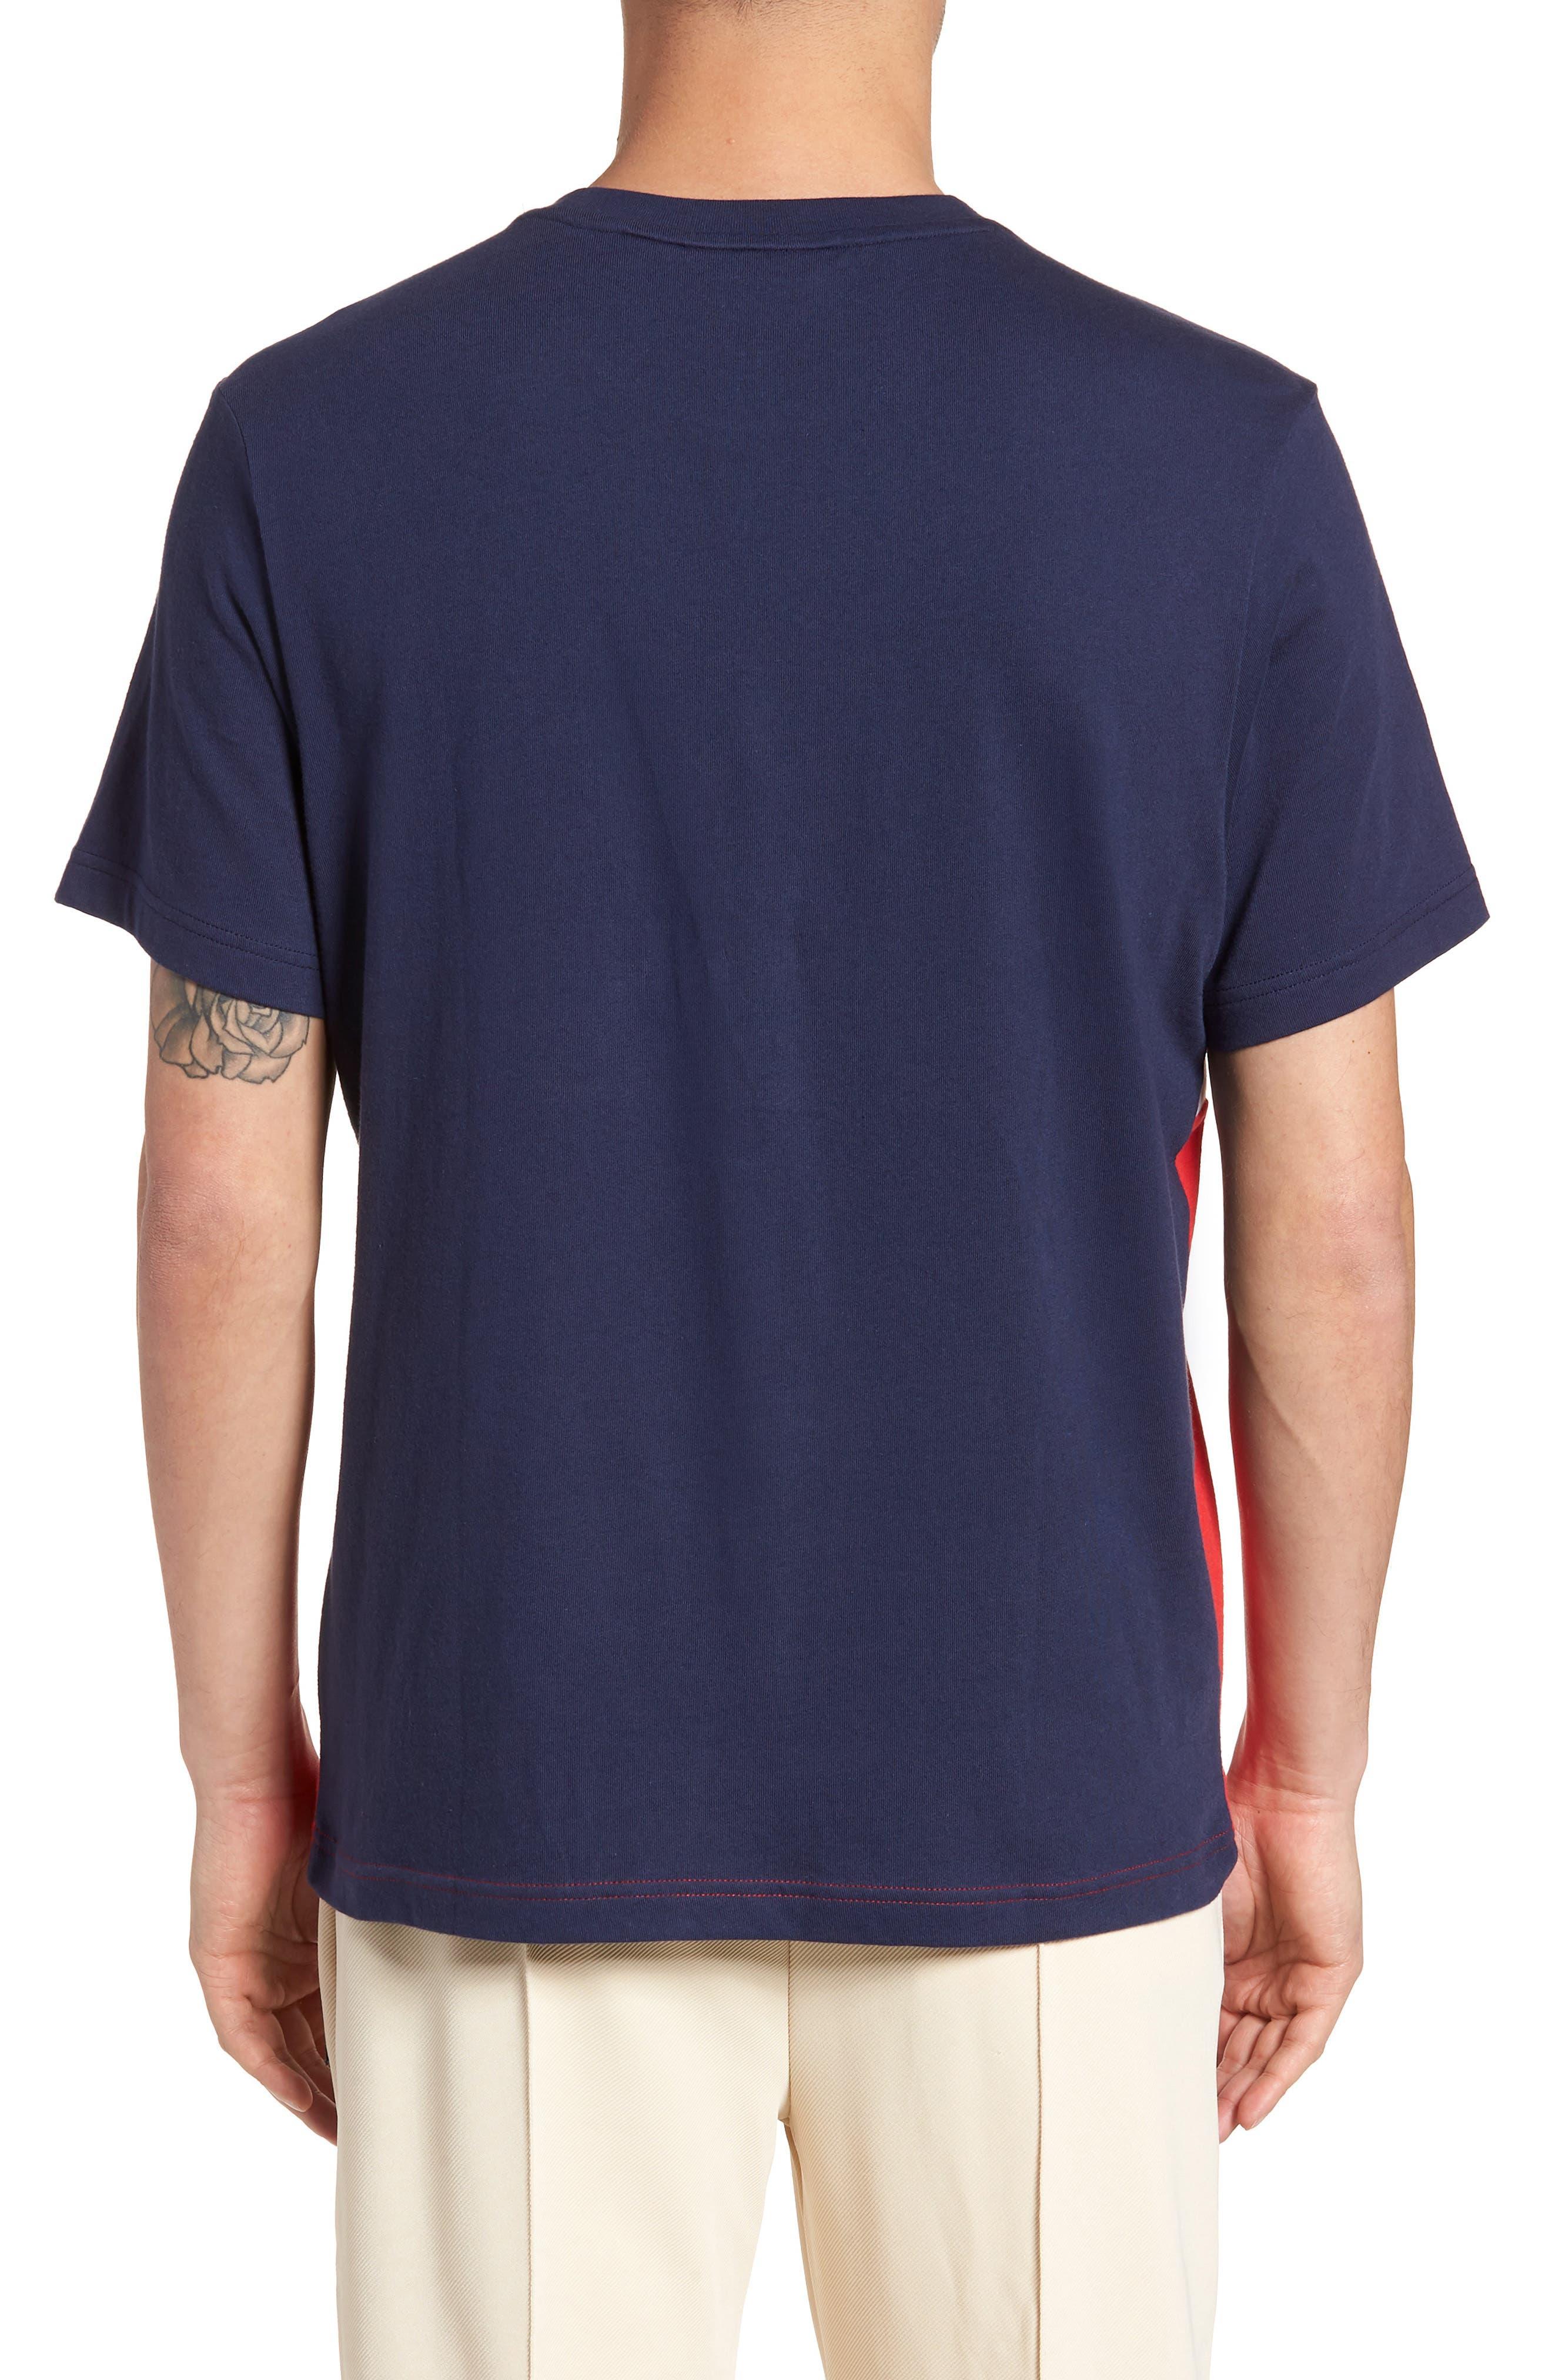 Biella Italia T-Shirt,                             Alternate thumbnail 4, color,